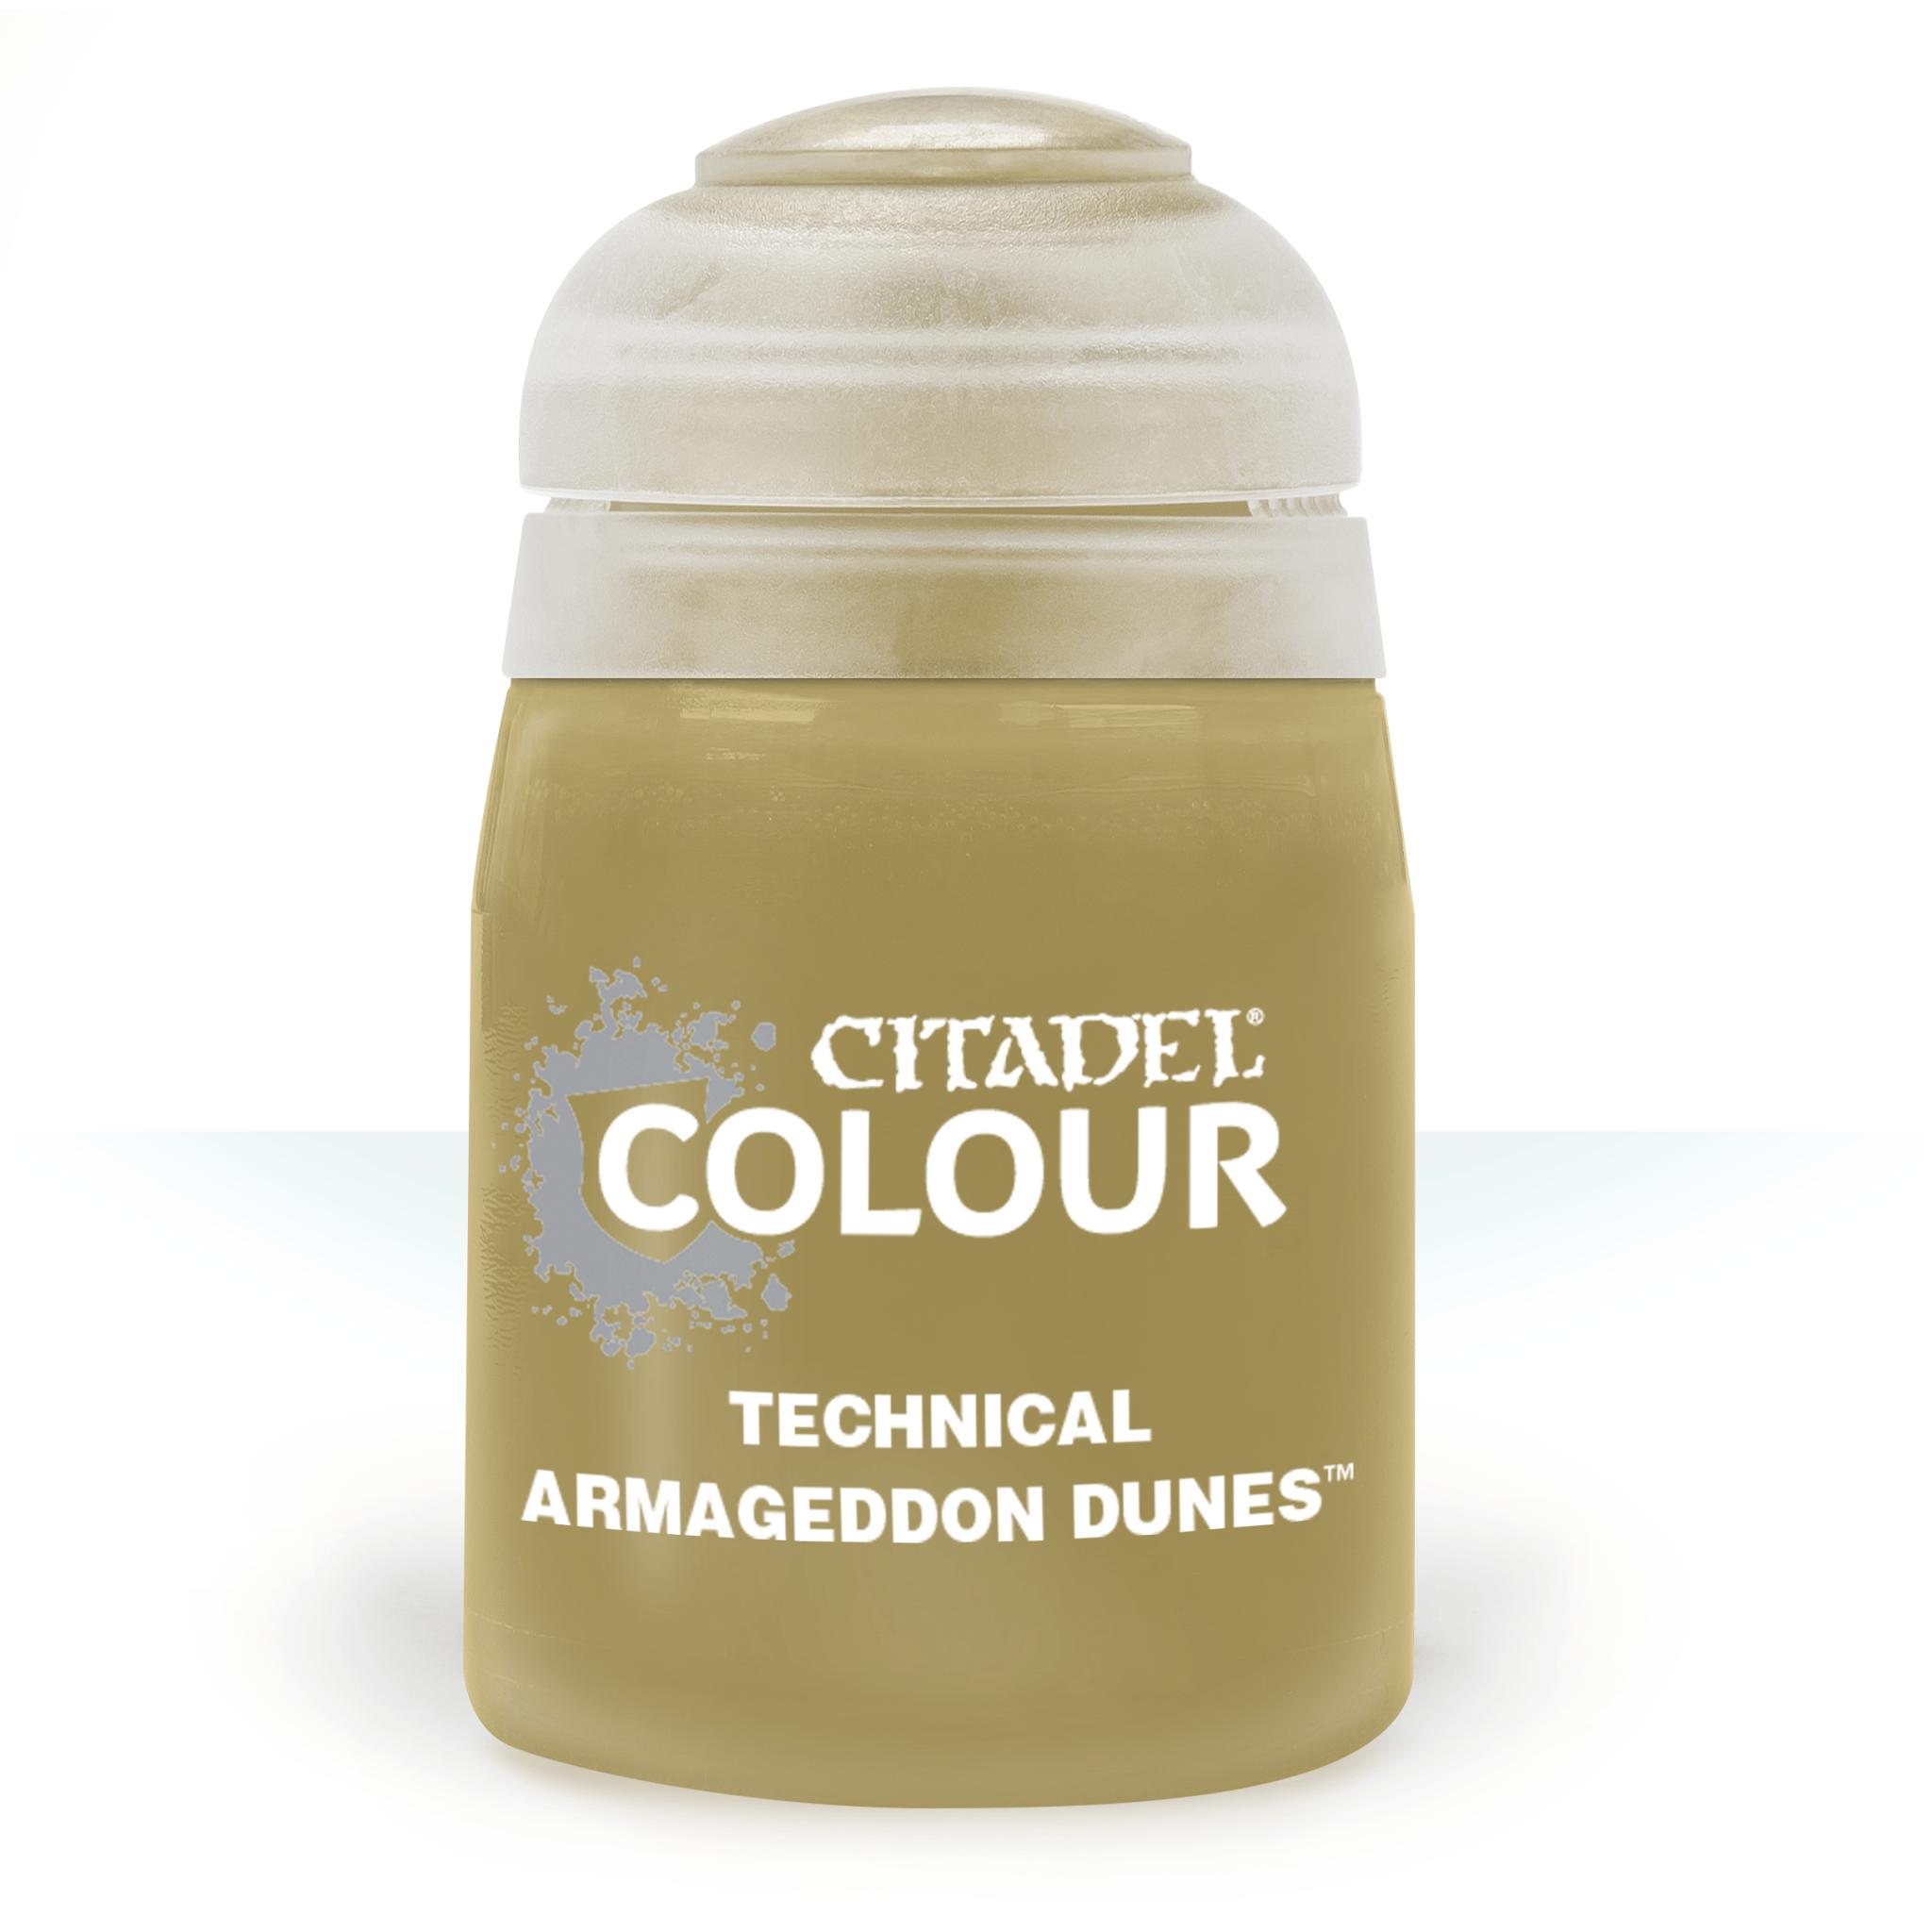 Armageddon Dunes (Technical 24ml)